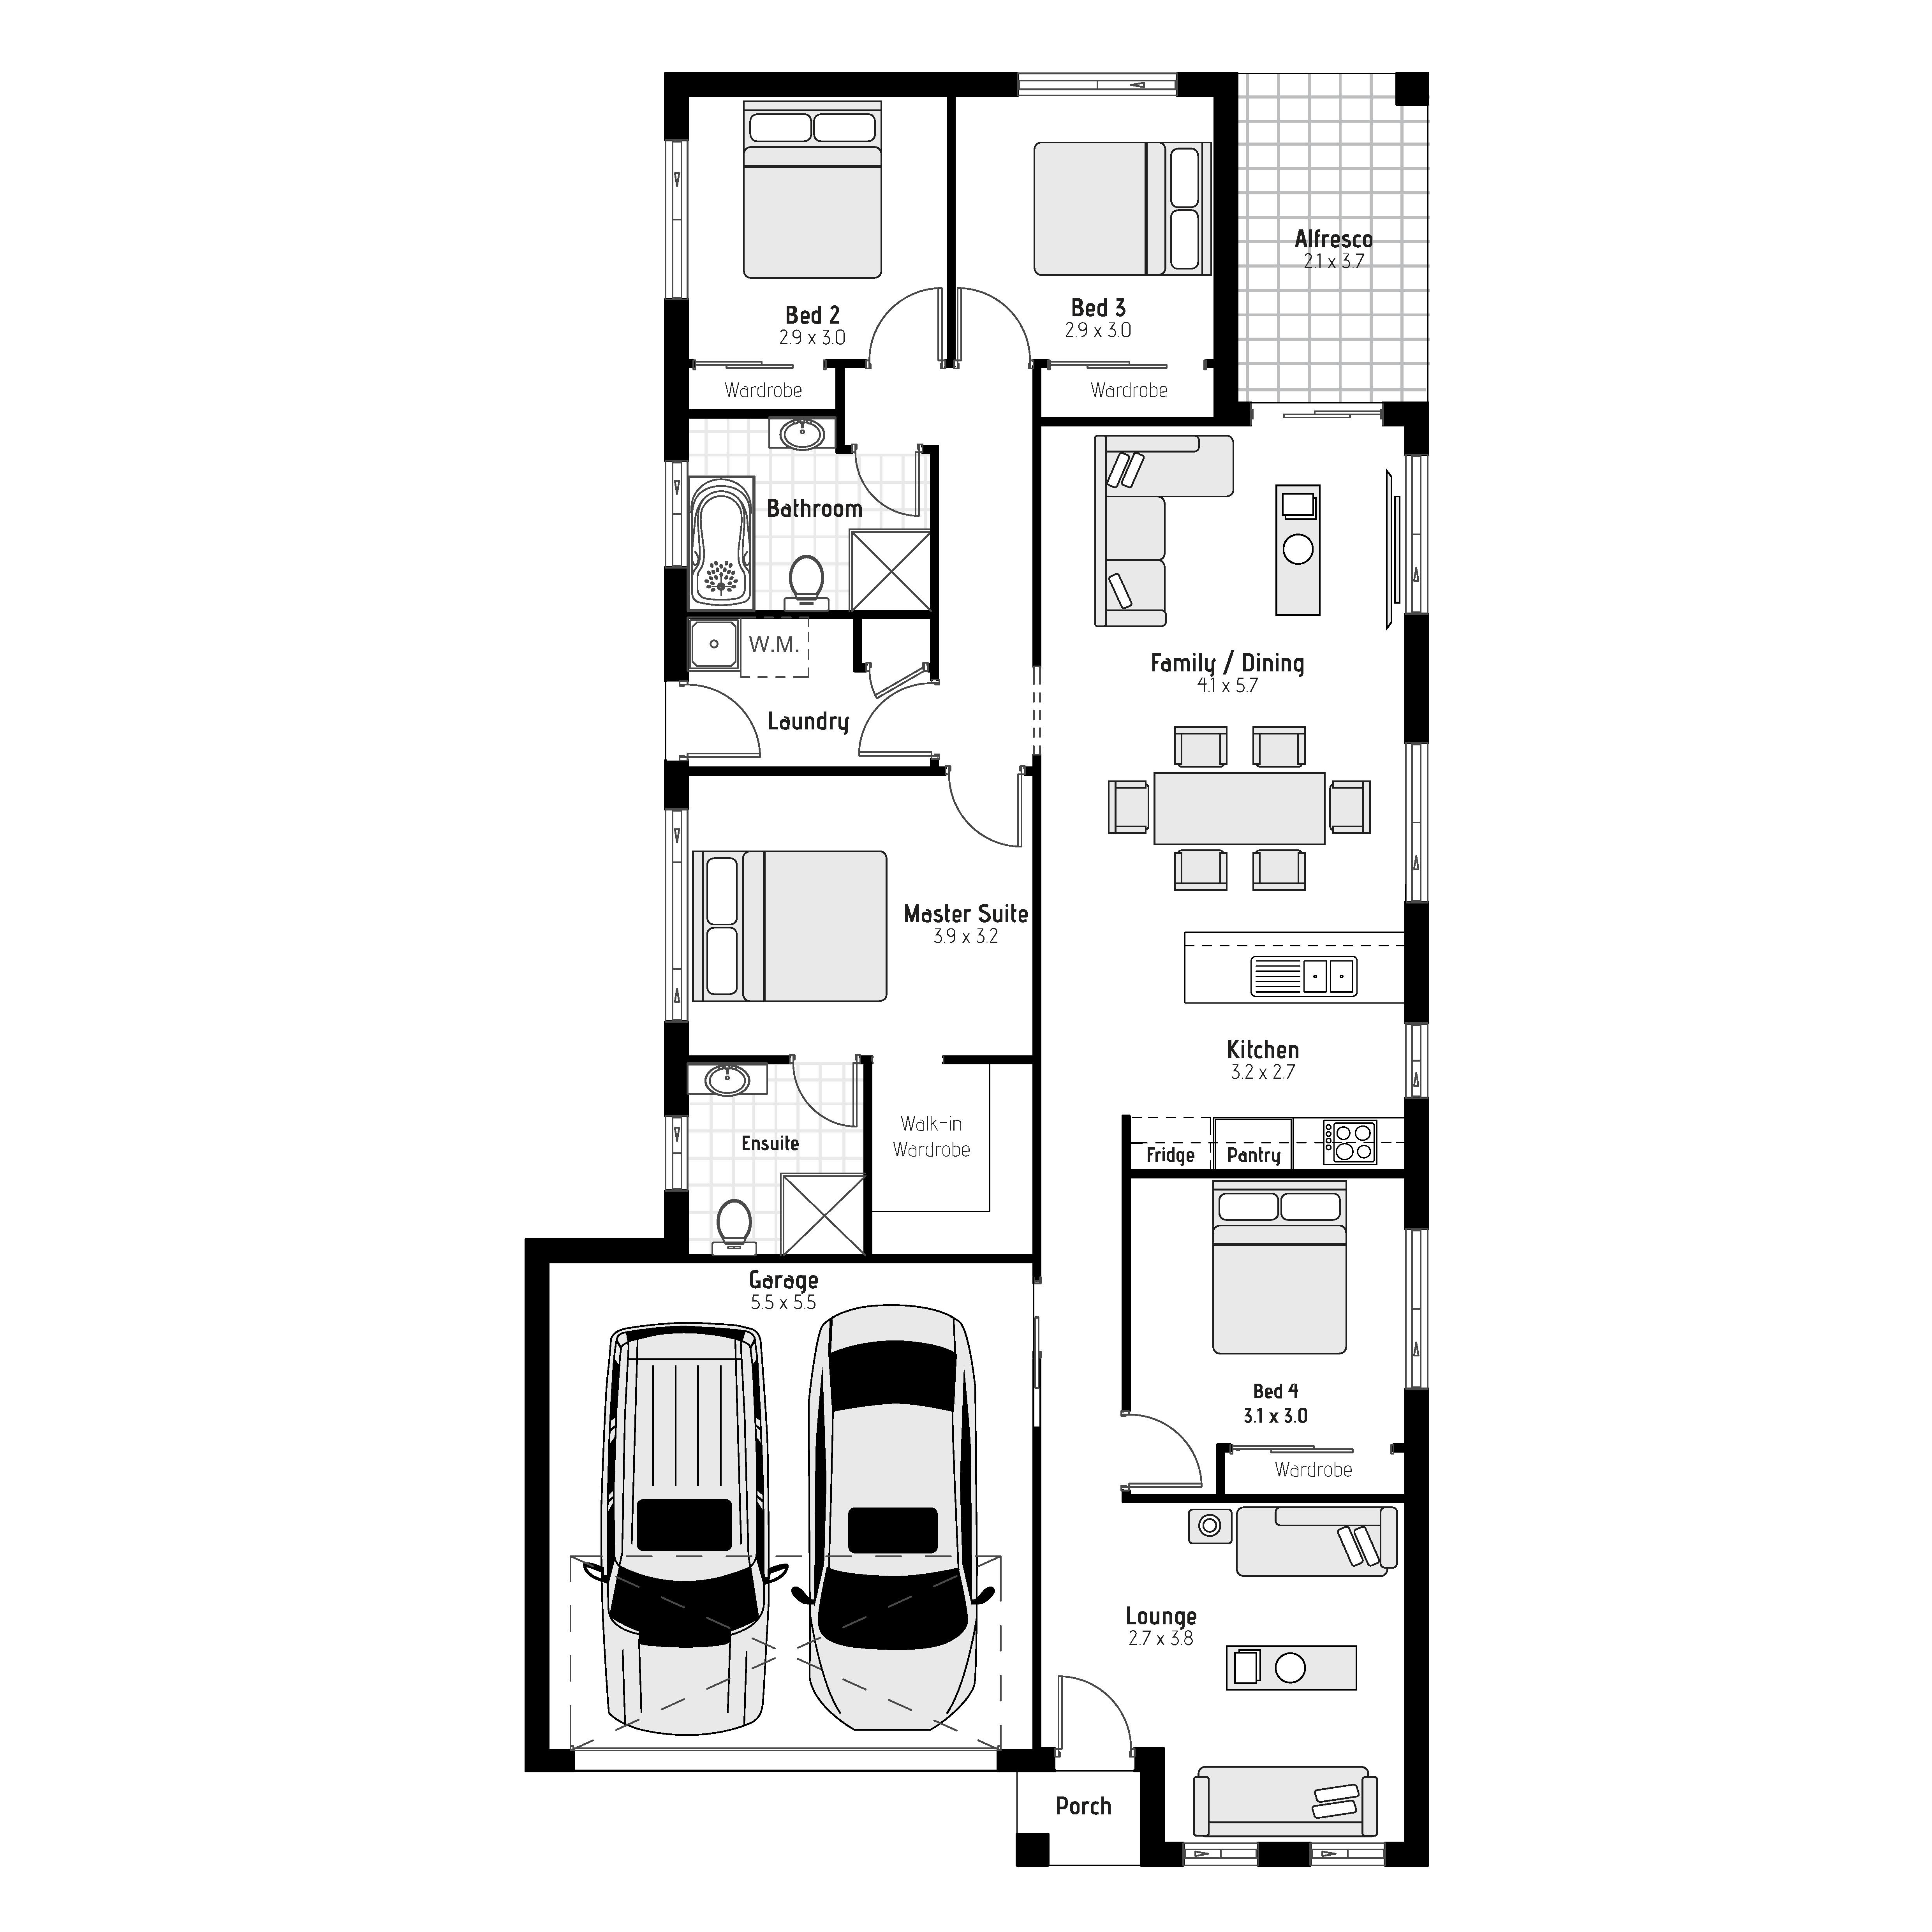 Acacia MKI Floor Plan Image